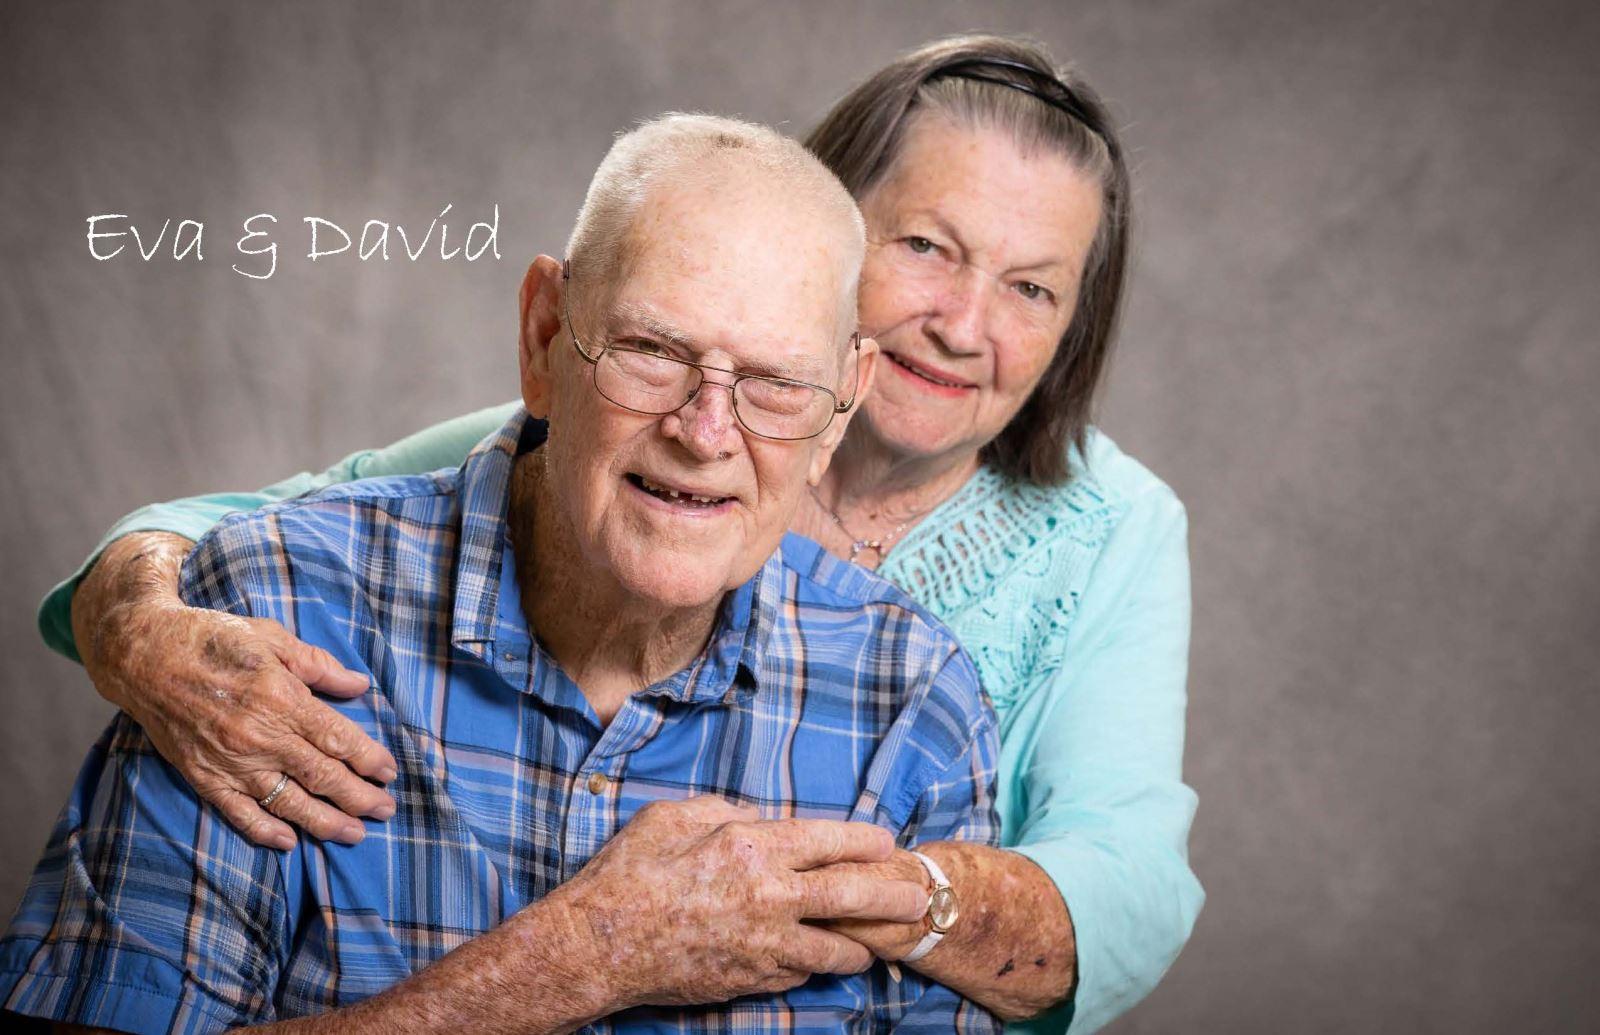 Eva and David